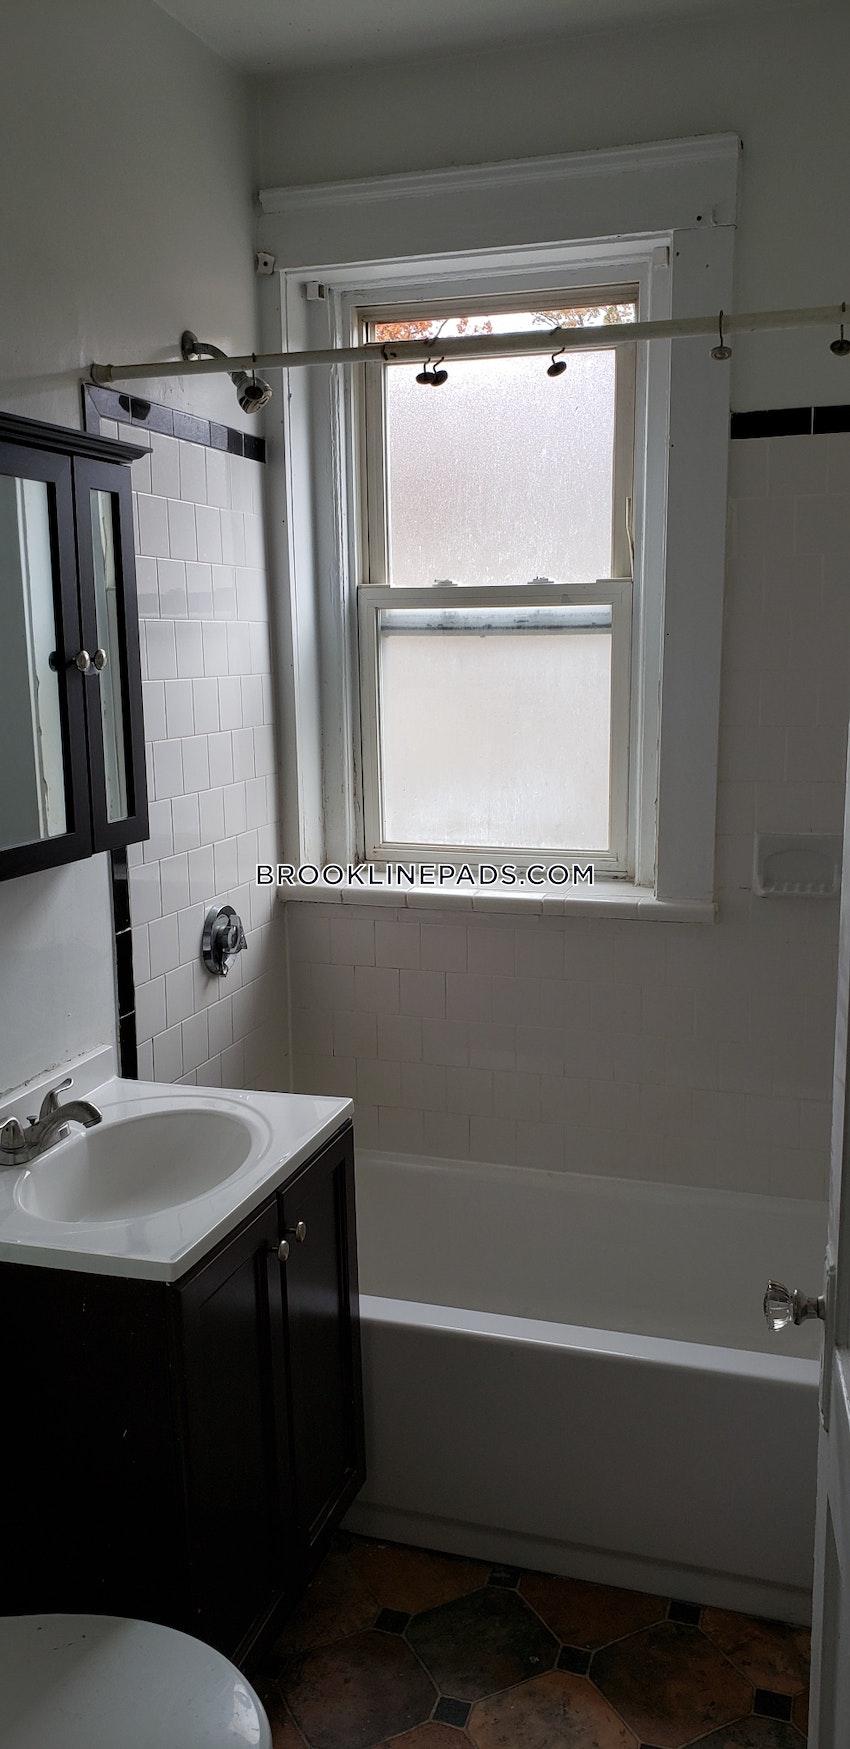 BROOKLINE- BOSTON UNIVERSITY - 4 Beds, 1.5 Baths - Image 24